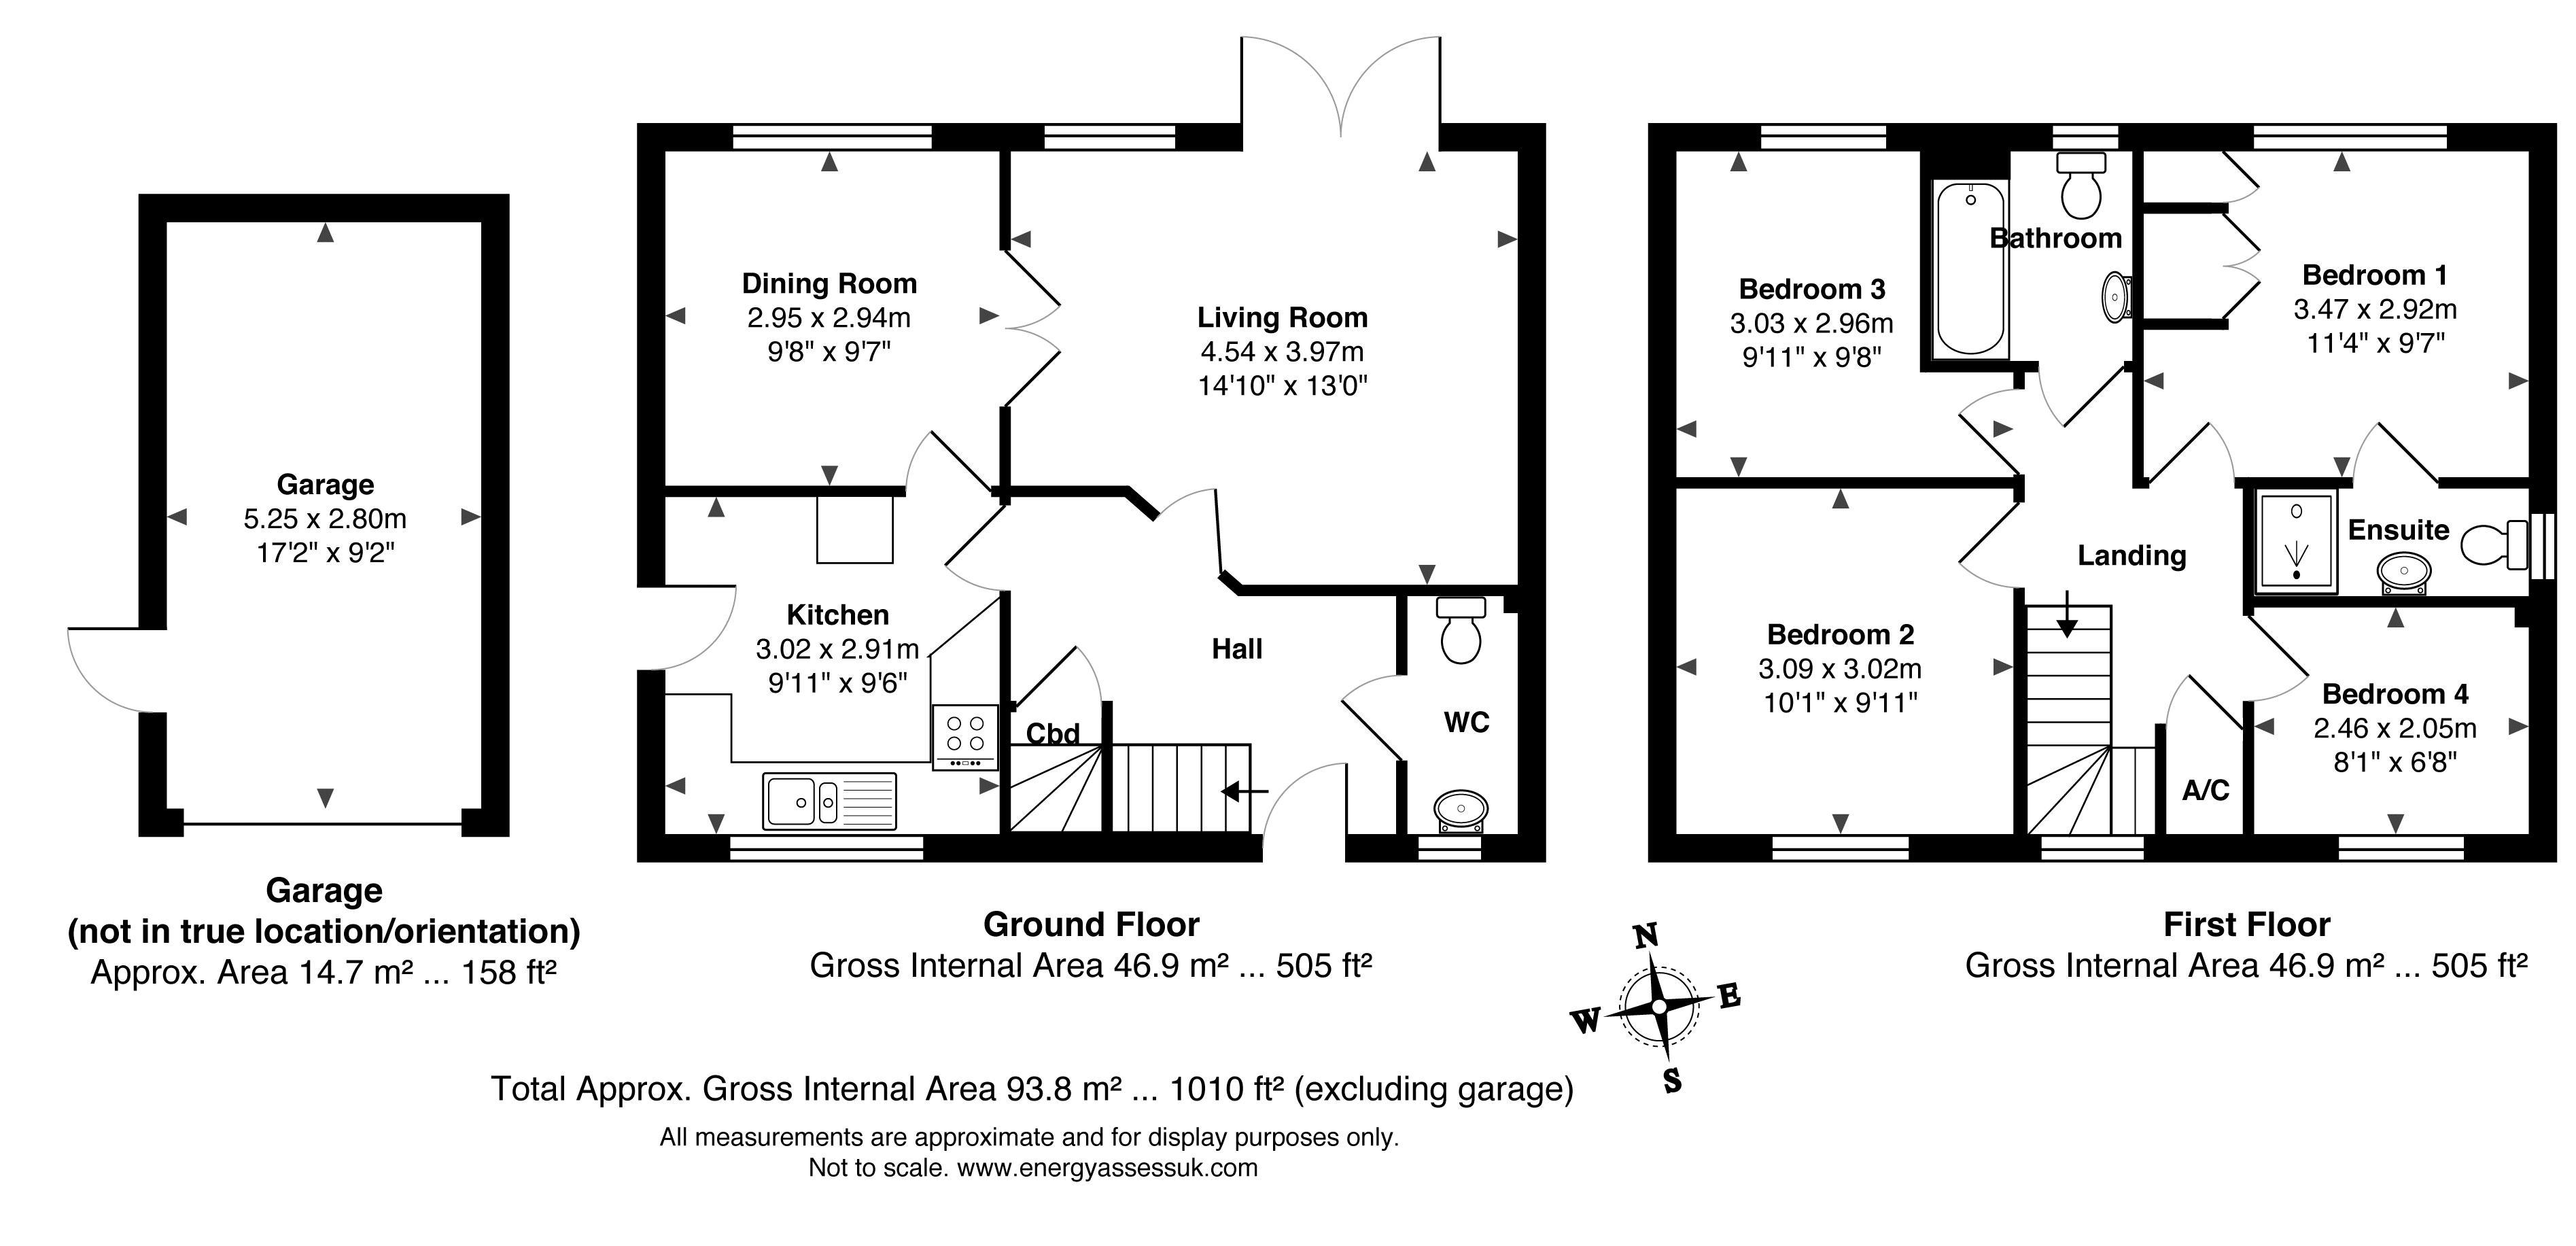 4 Bedroom Property For Sale In Guildford Surrey Gu2